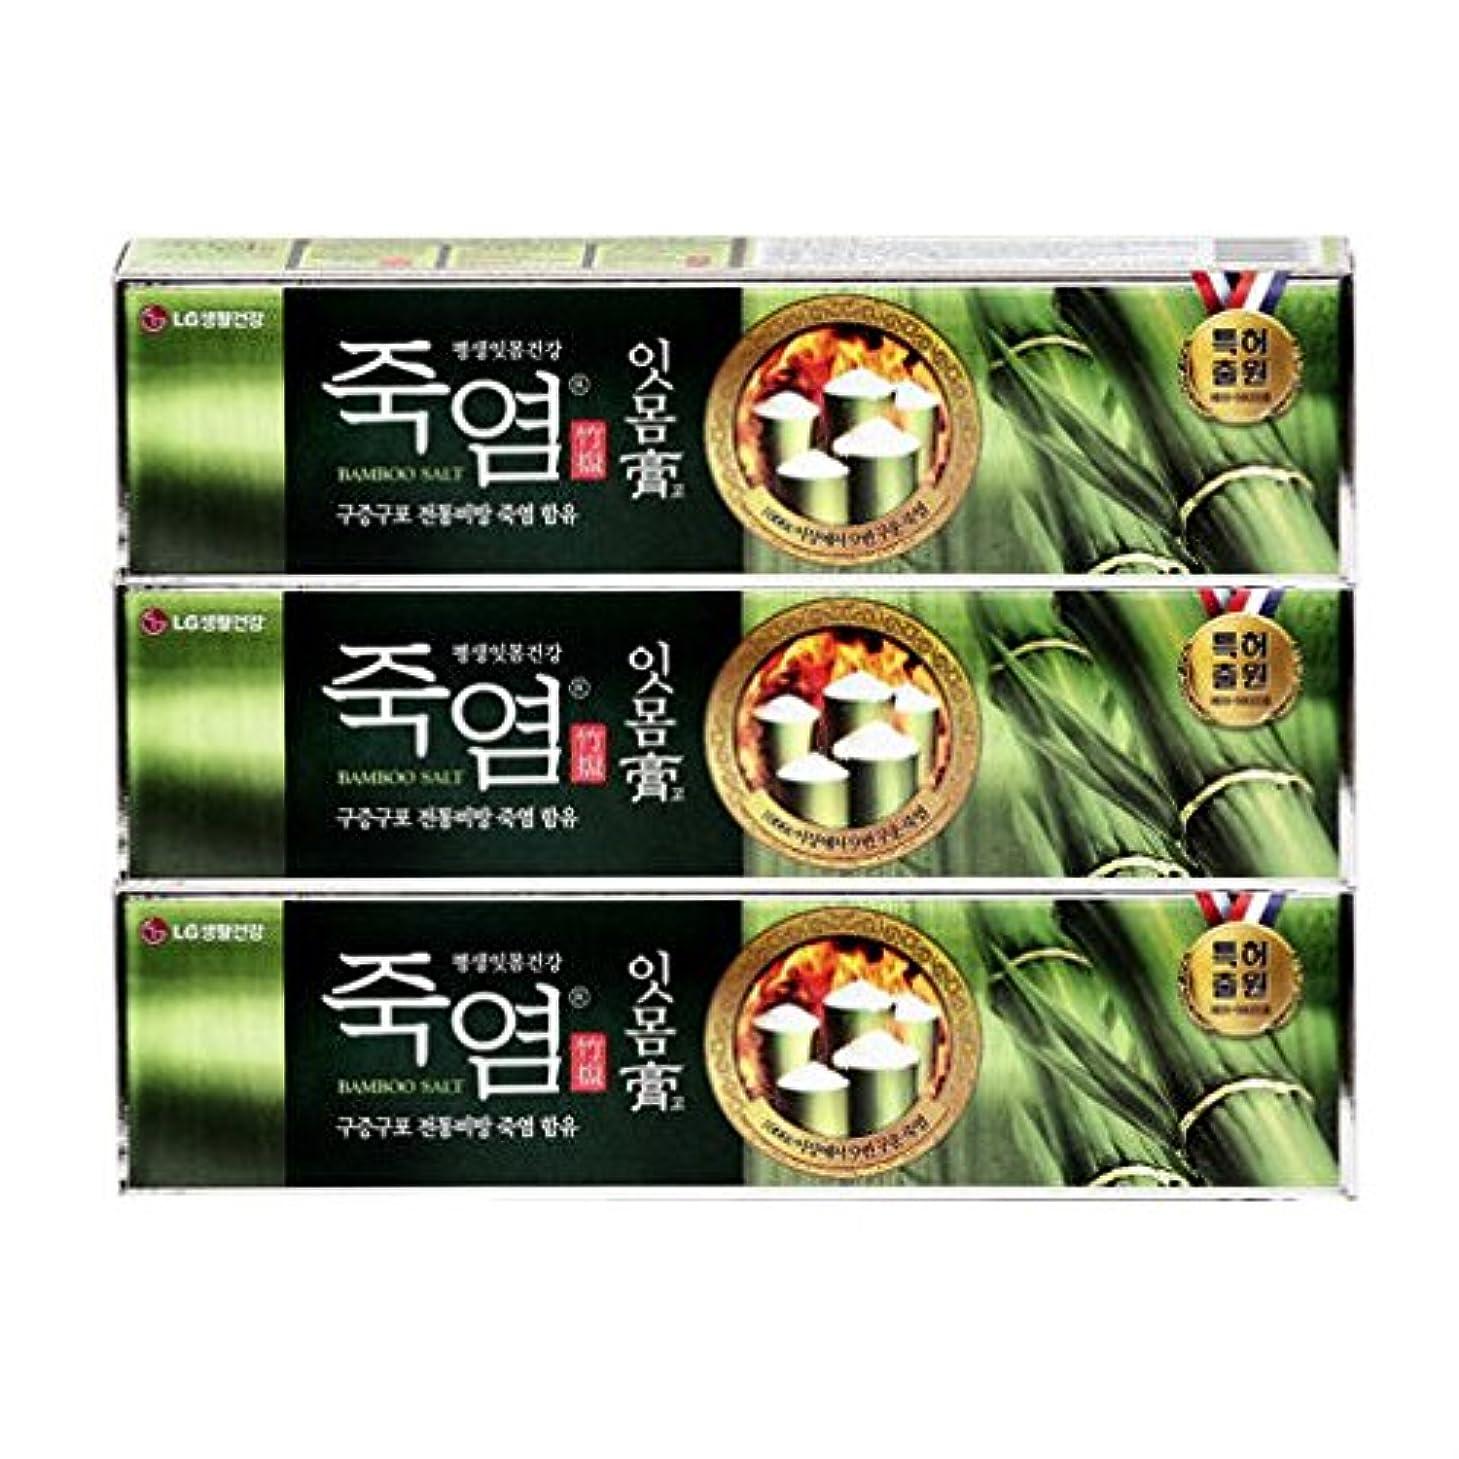 LG生活健康 竹塩歯磨き粉 (歯康膏:ウンガンゴ)(130g*3個) [海外直送品][並行輸入品]